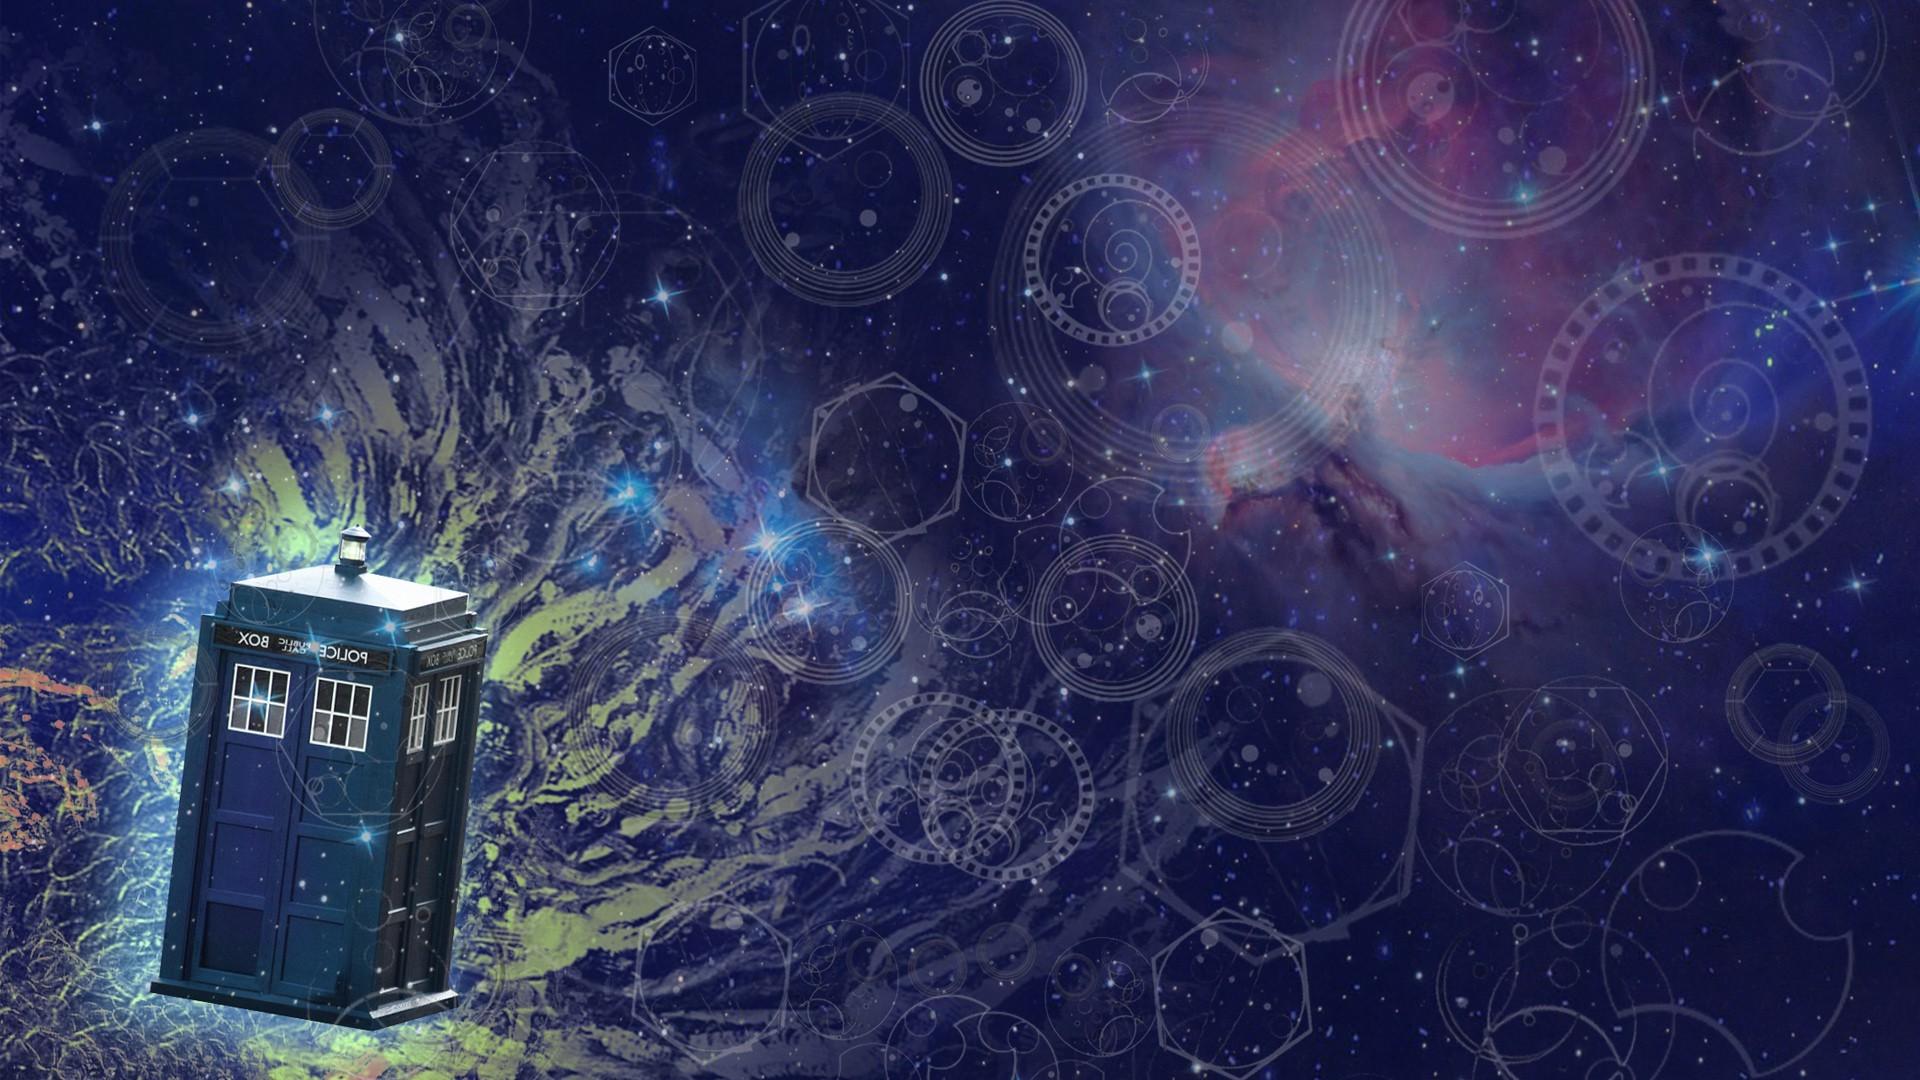 Doctor Who Desktop Wallpaper 64 images